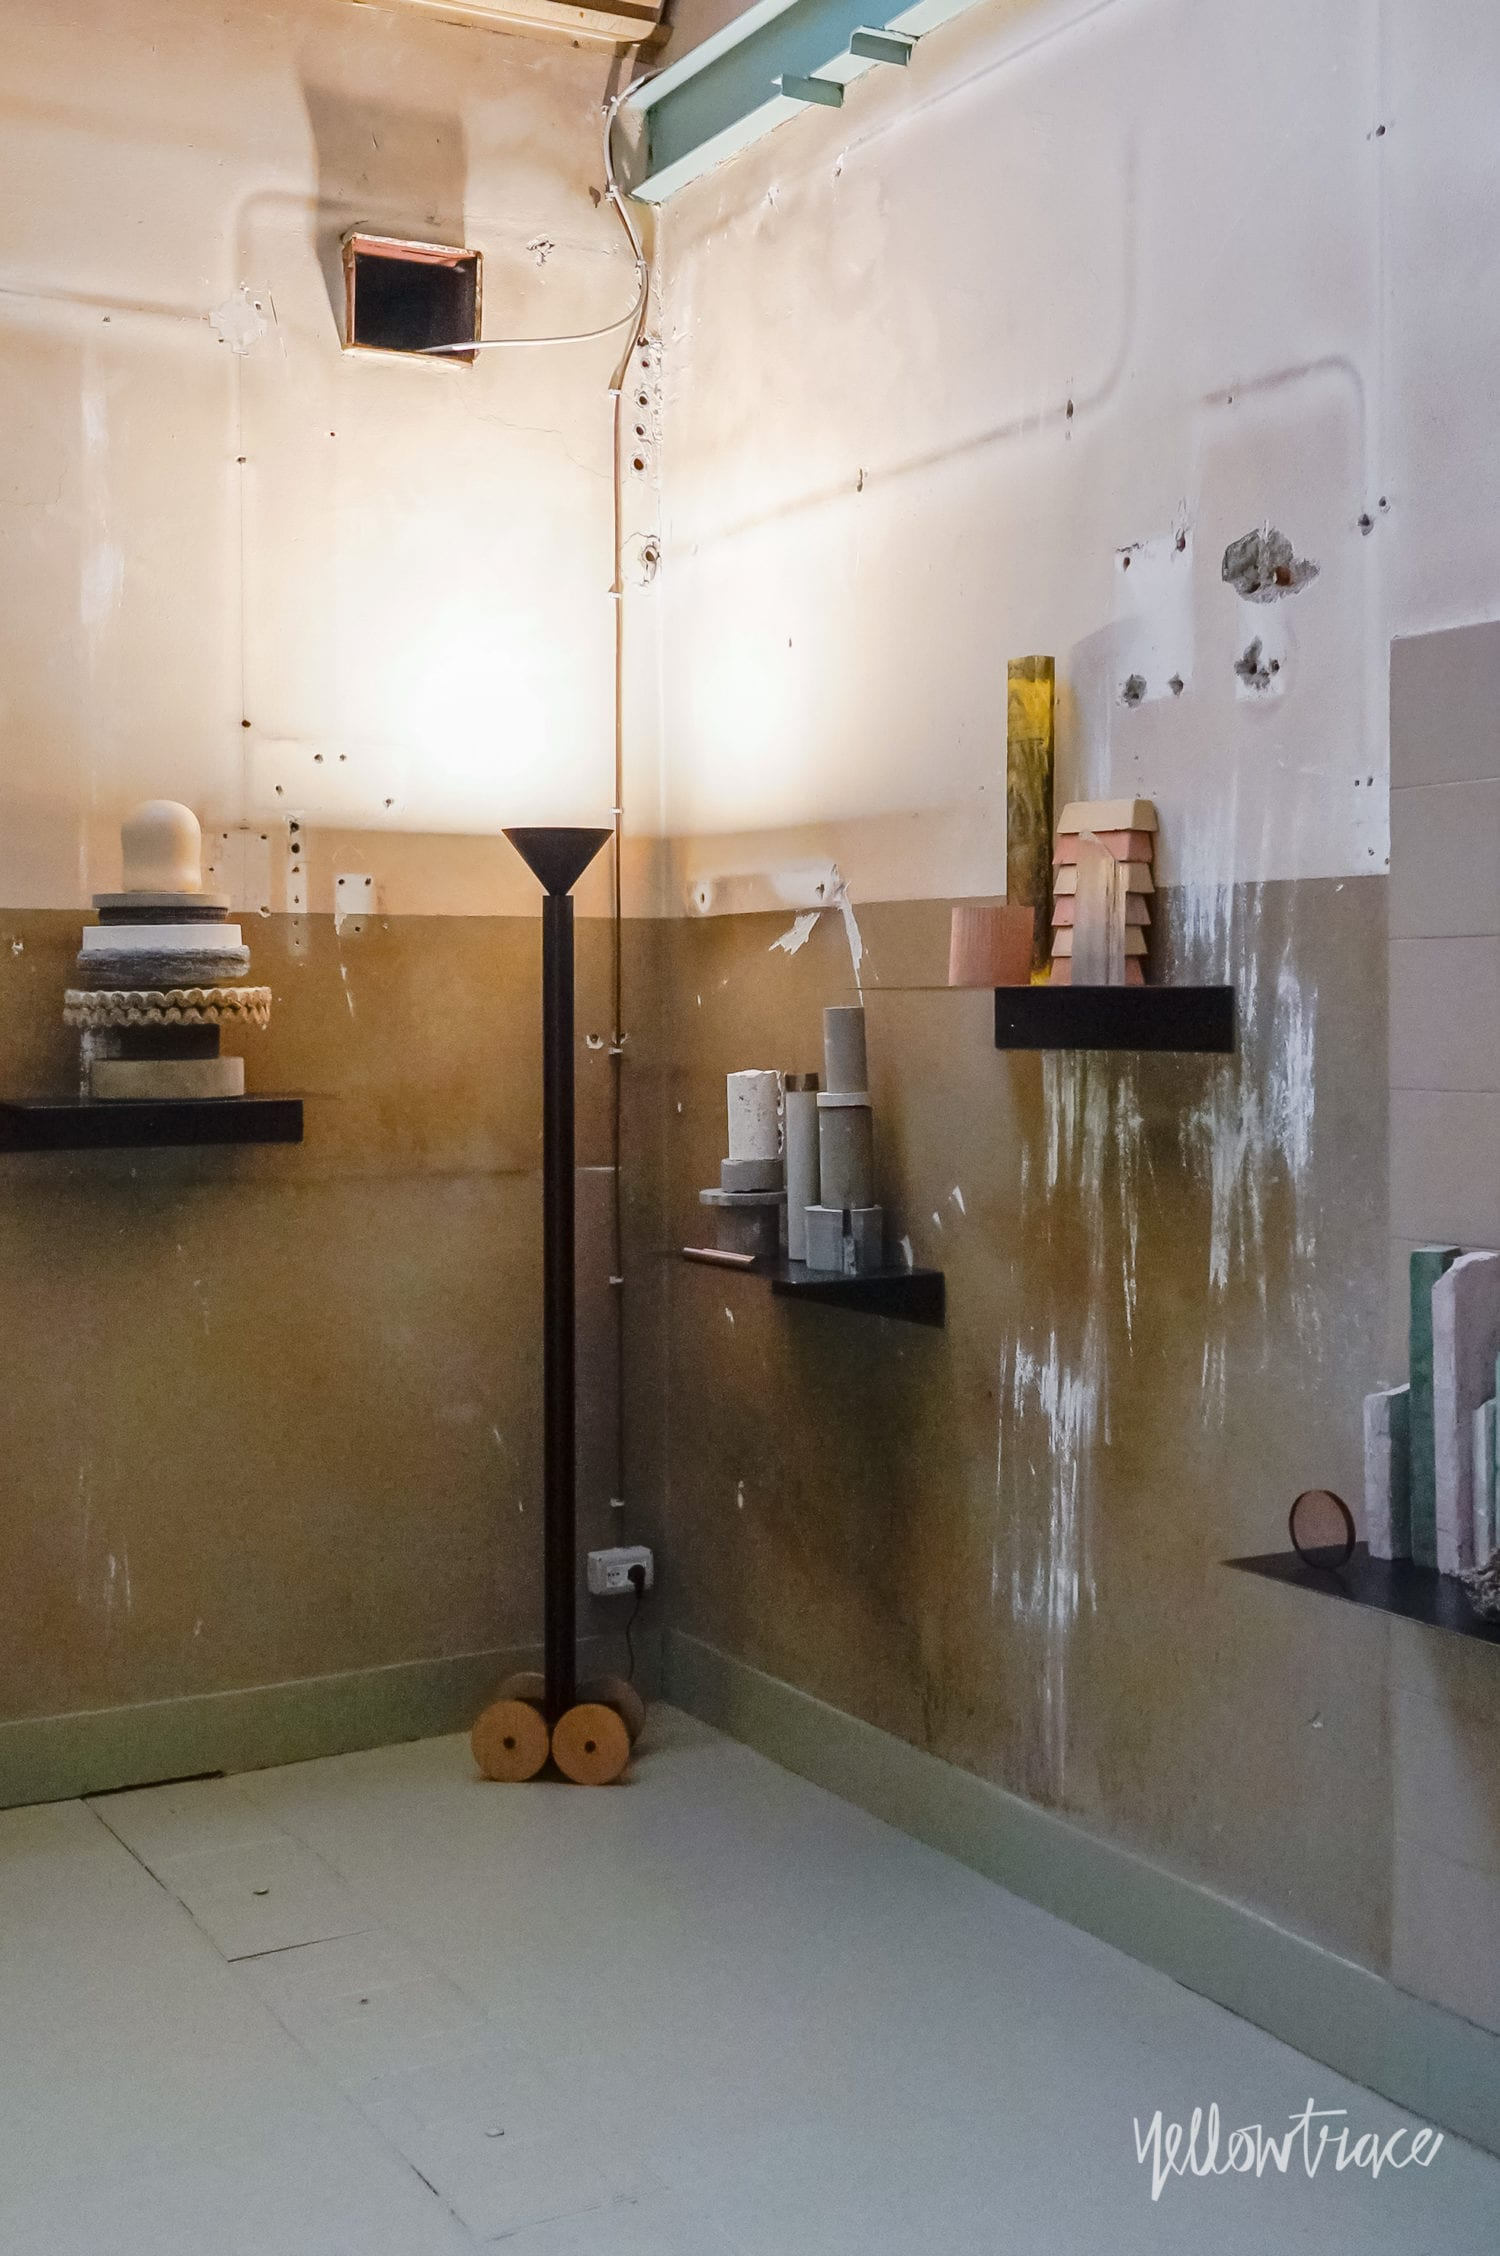 Les Arcanistes Studiopepe At Milan Design Week 2019 Photo Nick Hughes Yellowtrace 33